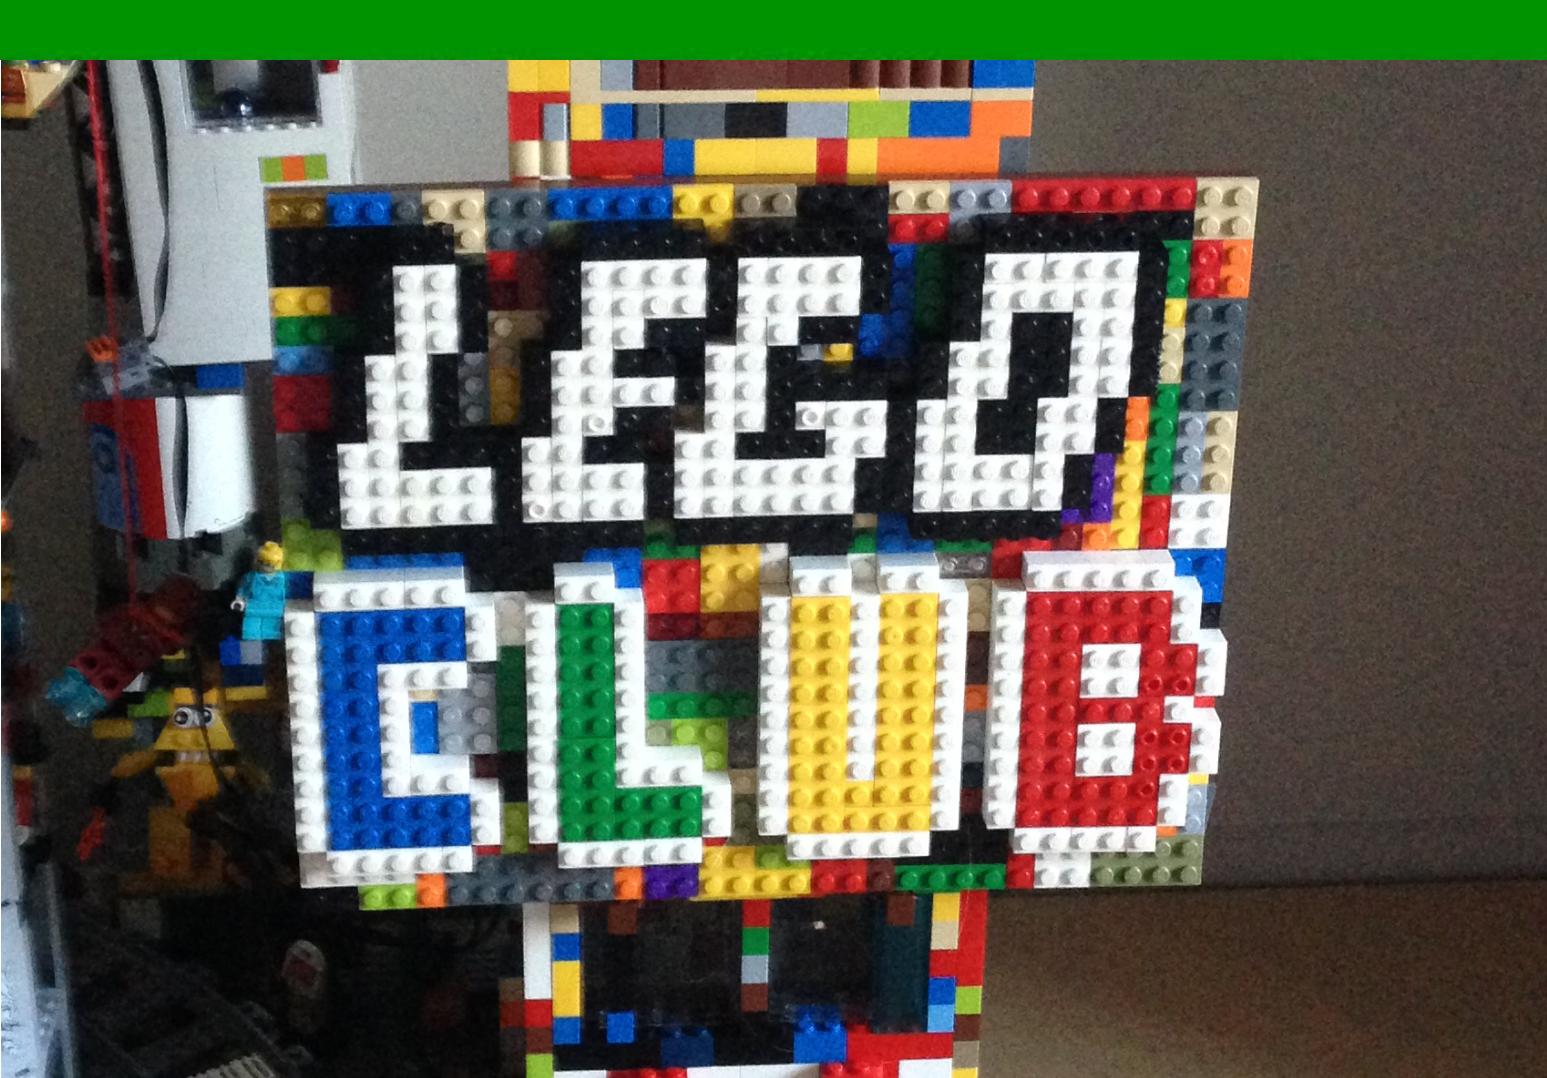 LEGO Club thumbnail image.